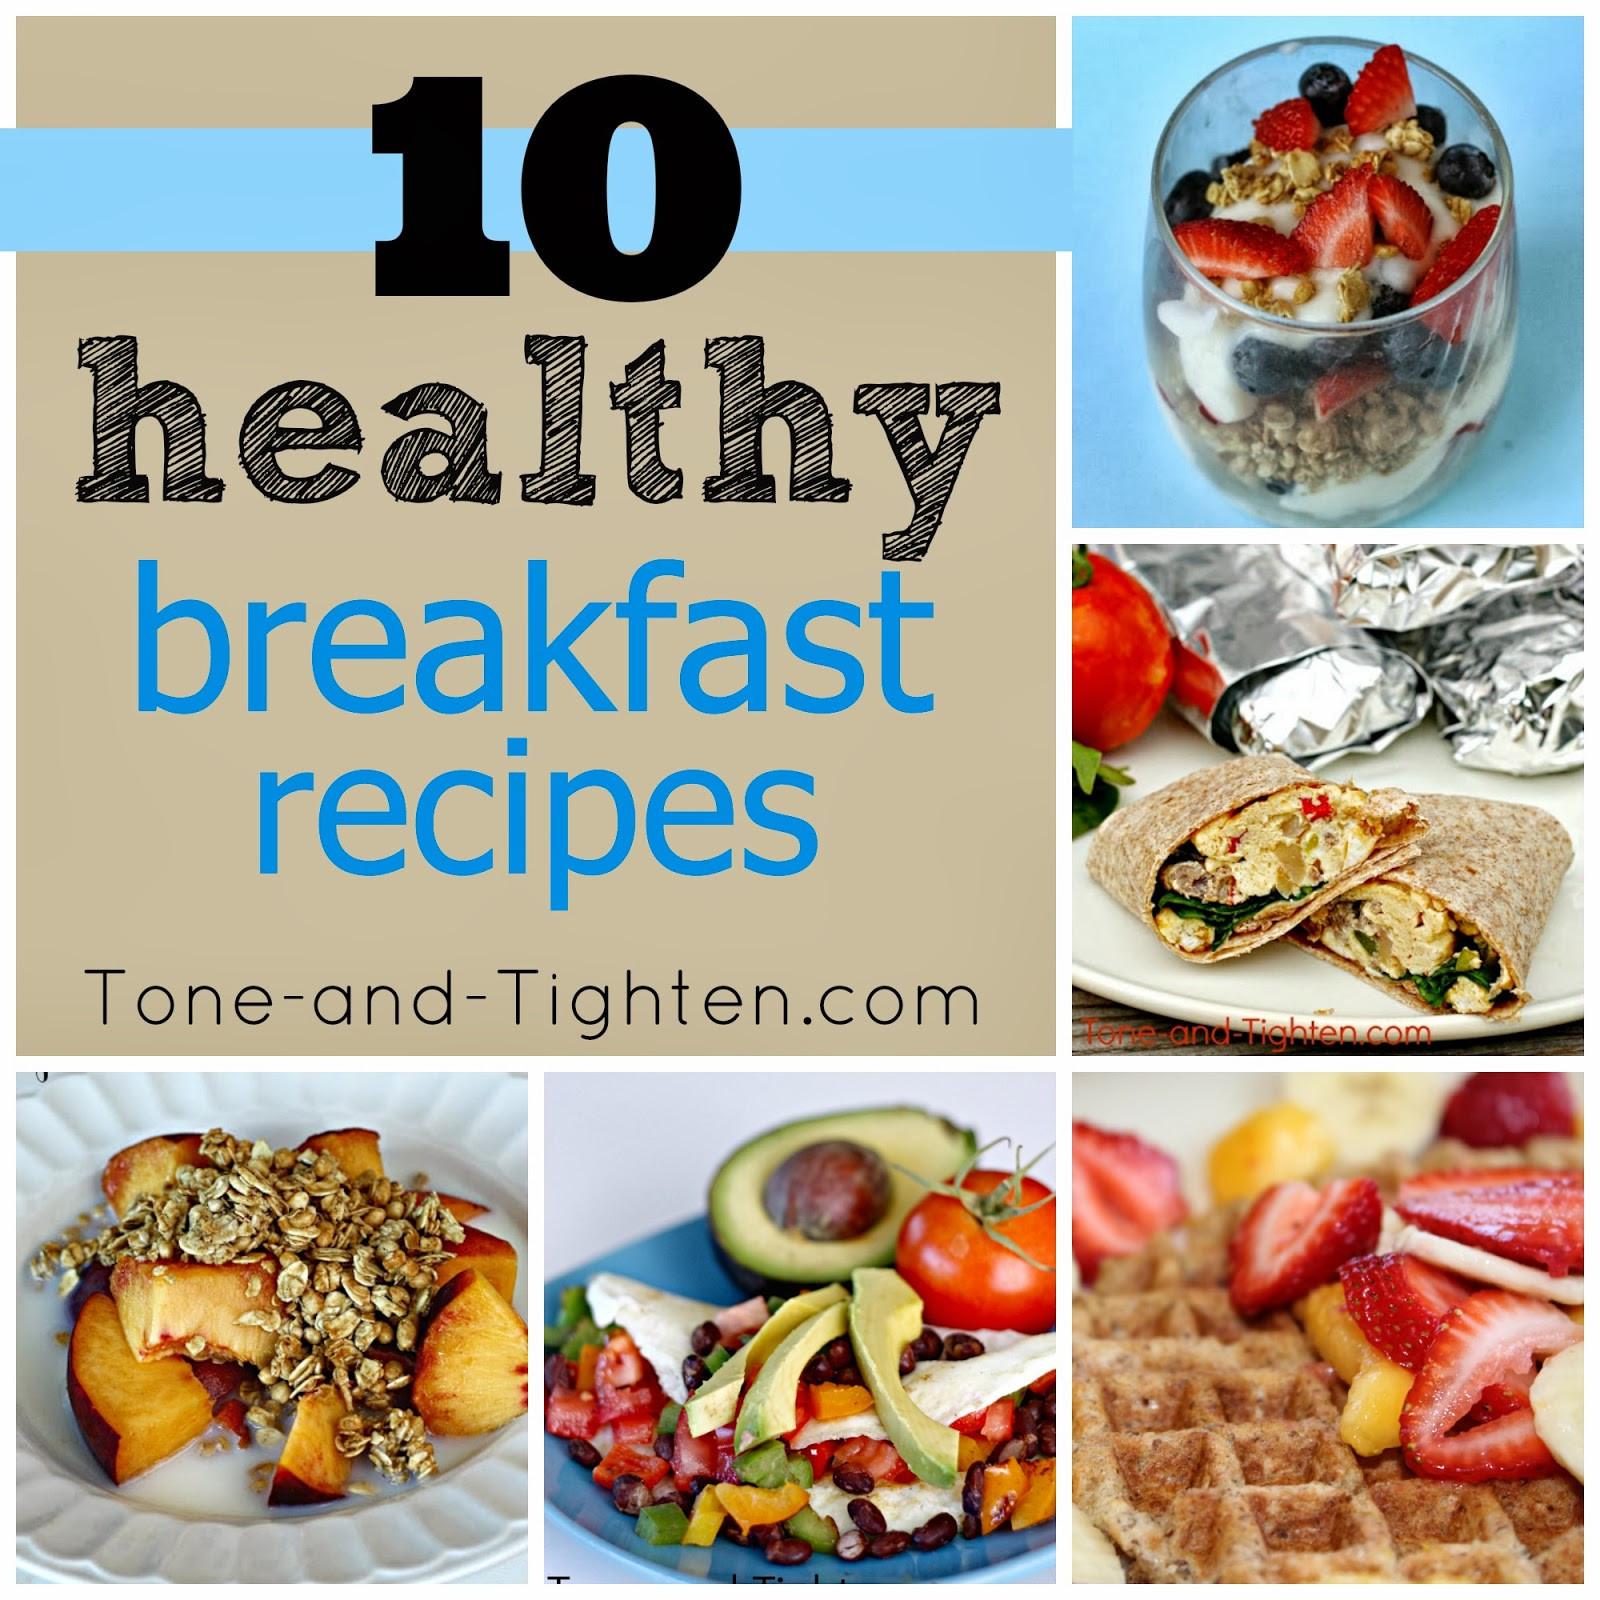 Healthy Recipes Breakfast  10 QUICK Healthy Breakfast Recipes